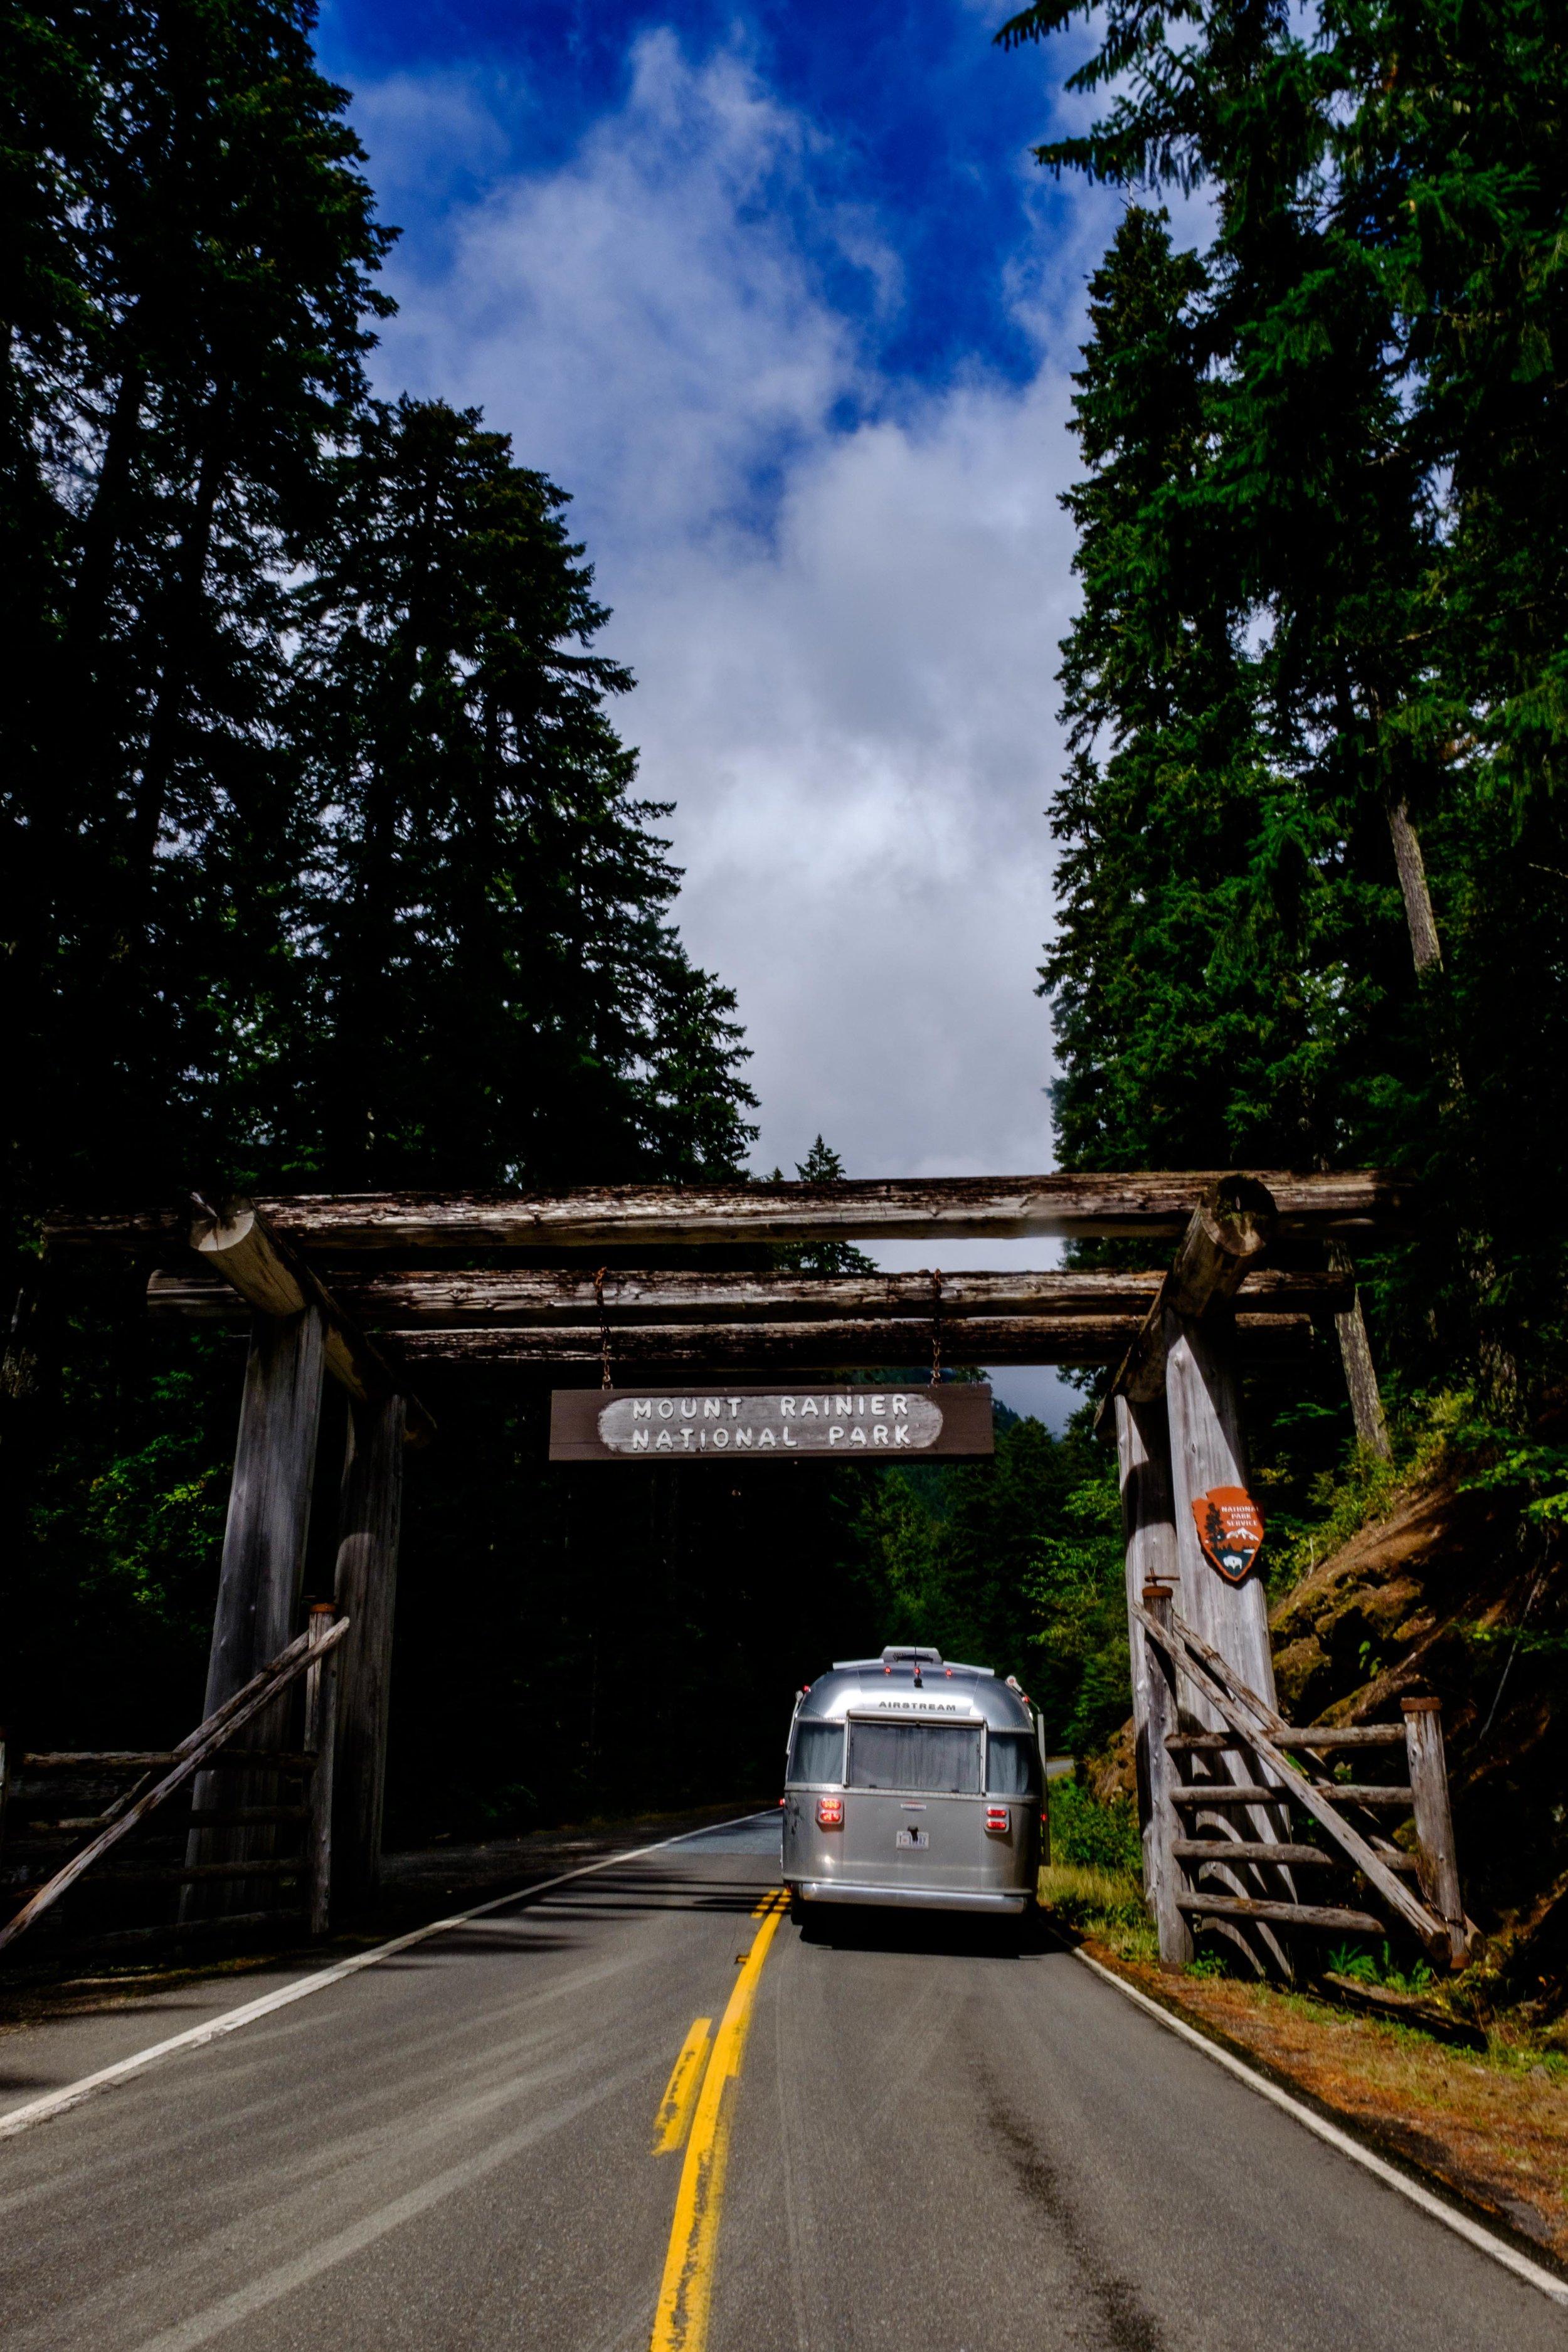 20160906-SP-Mount Rainier National Park-_DSF2181.jpg